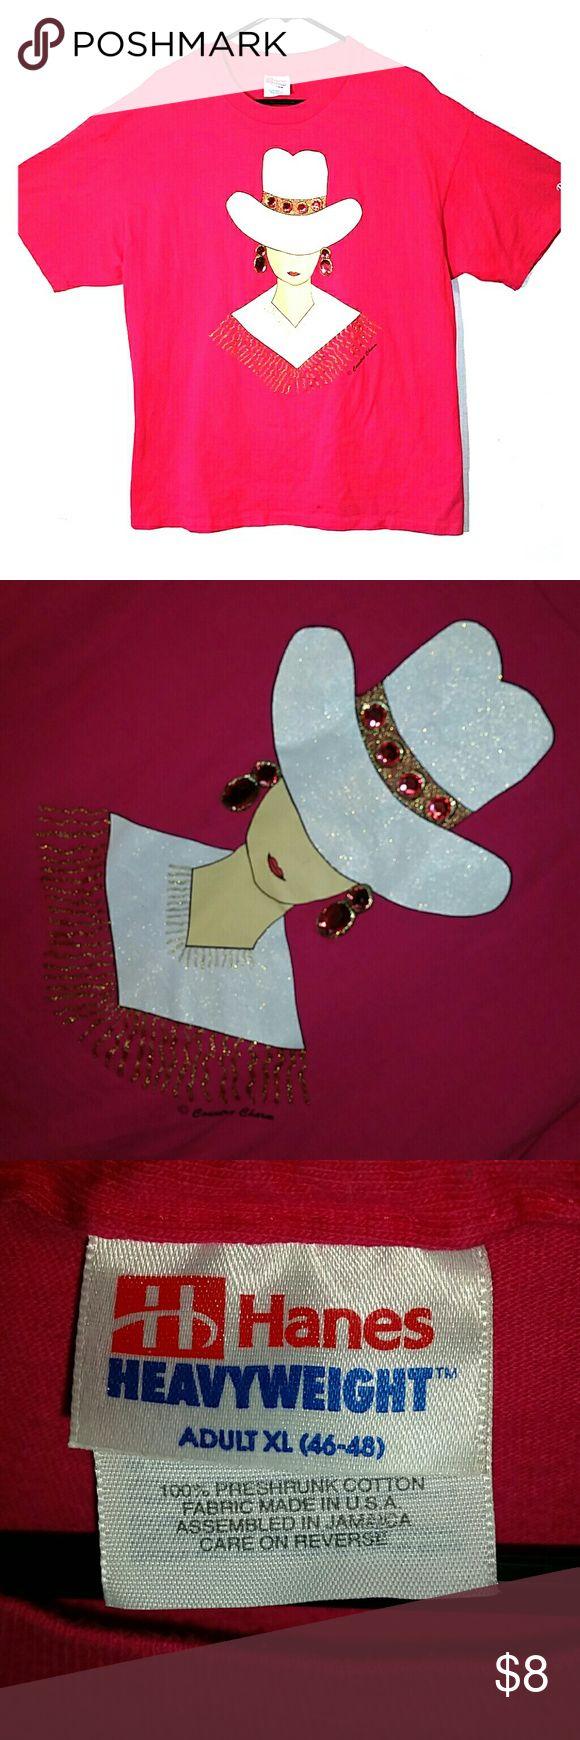 Hot pink lady w rhinestones t shirt sz xl Hot pink lady with rhinestones T-shirt size XL Hanes Tops